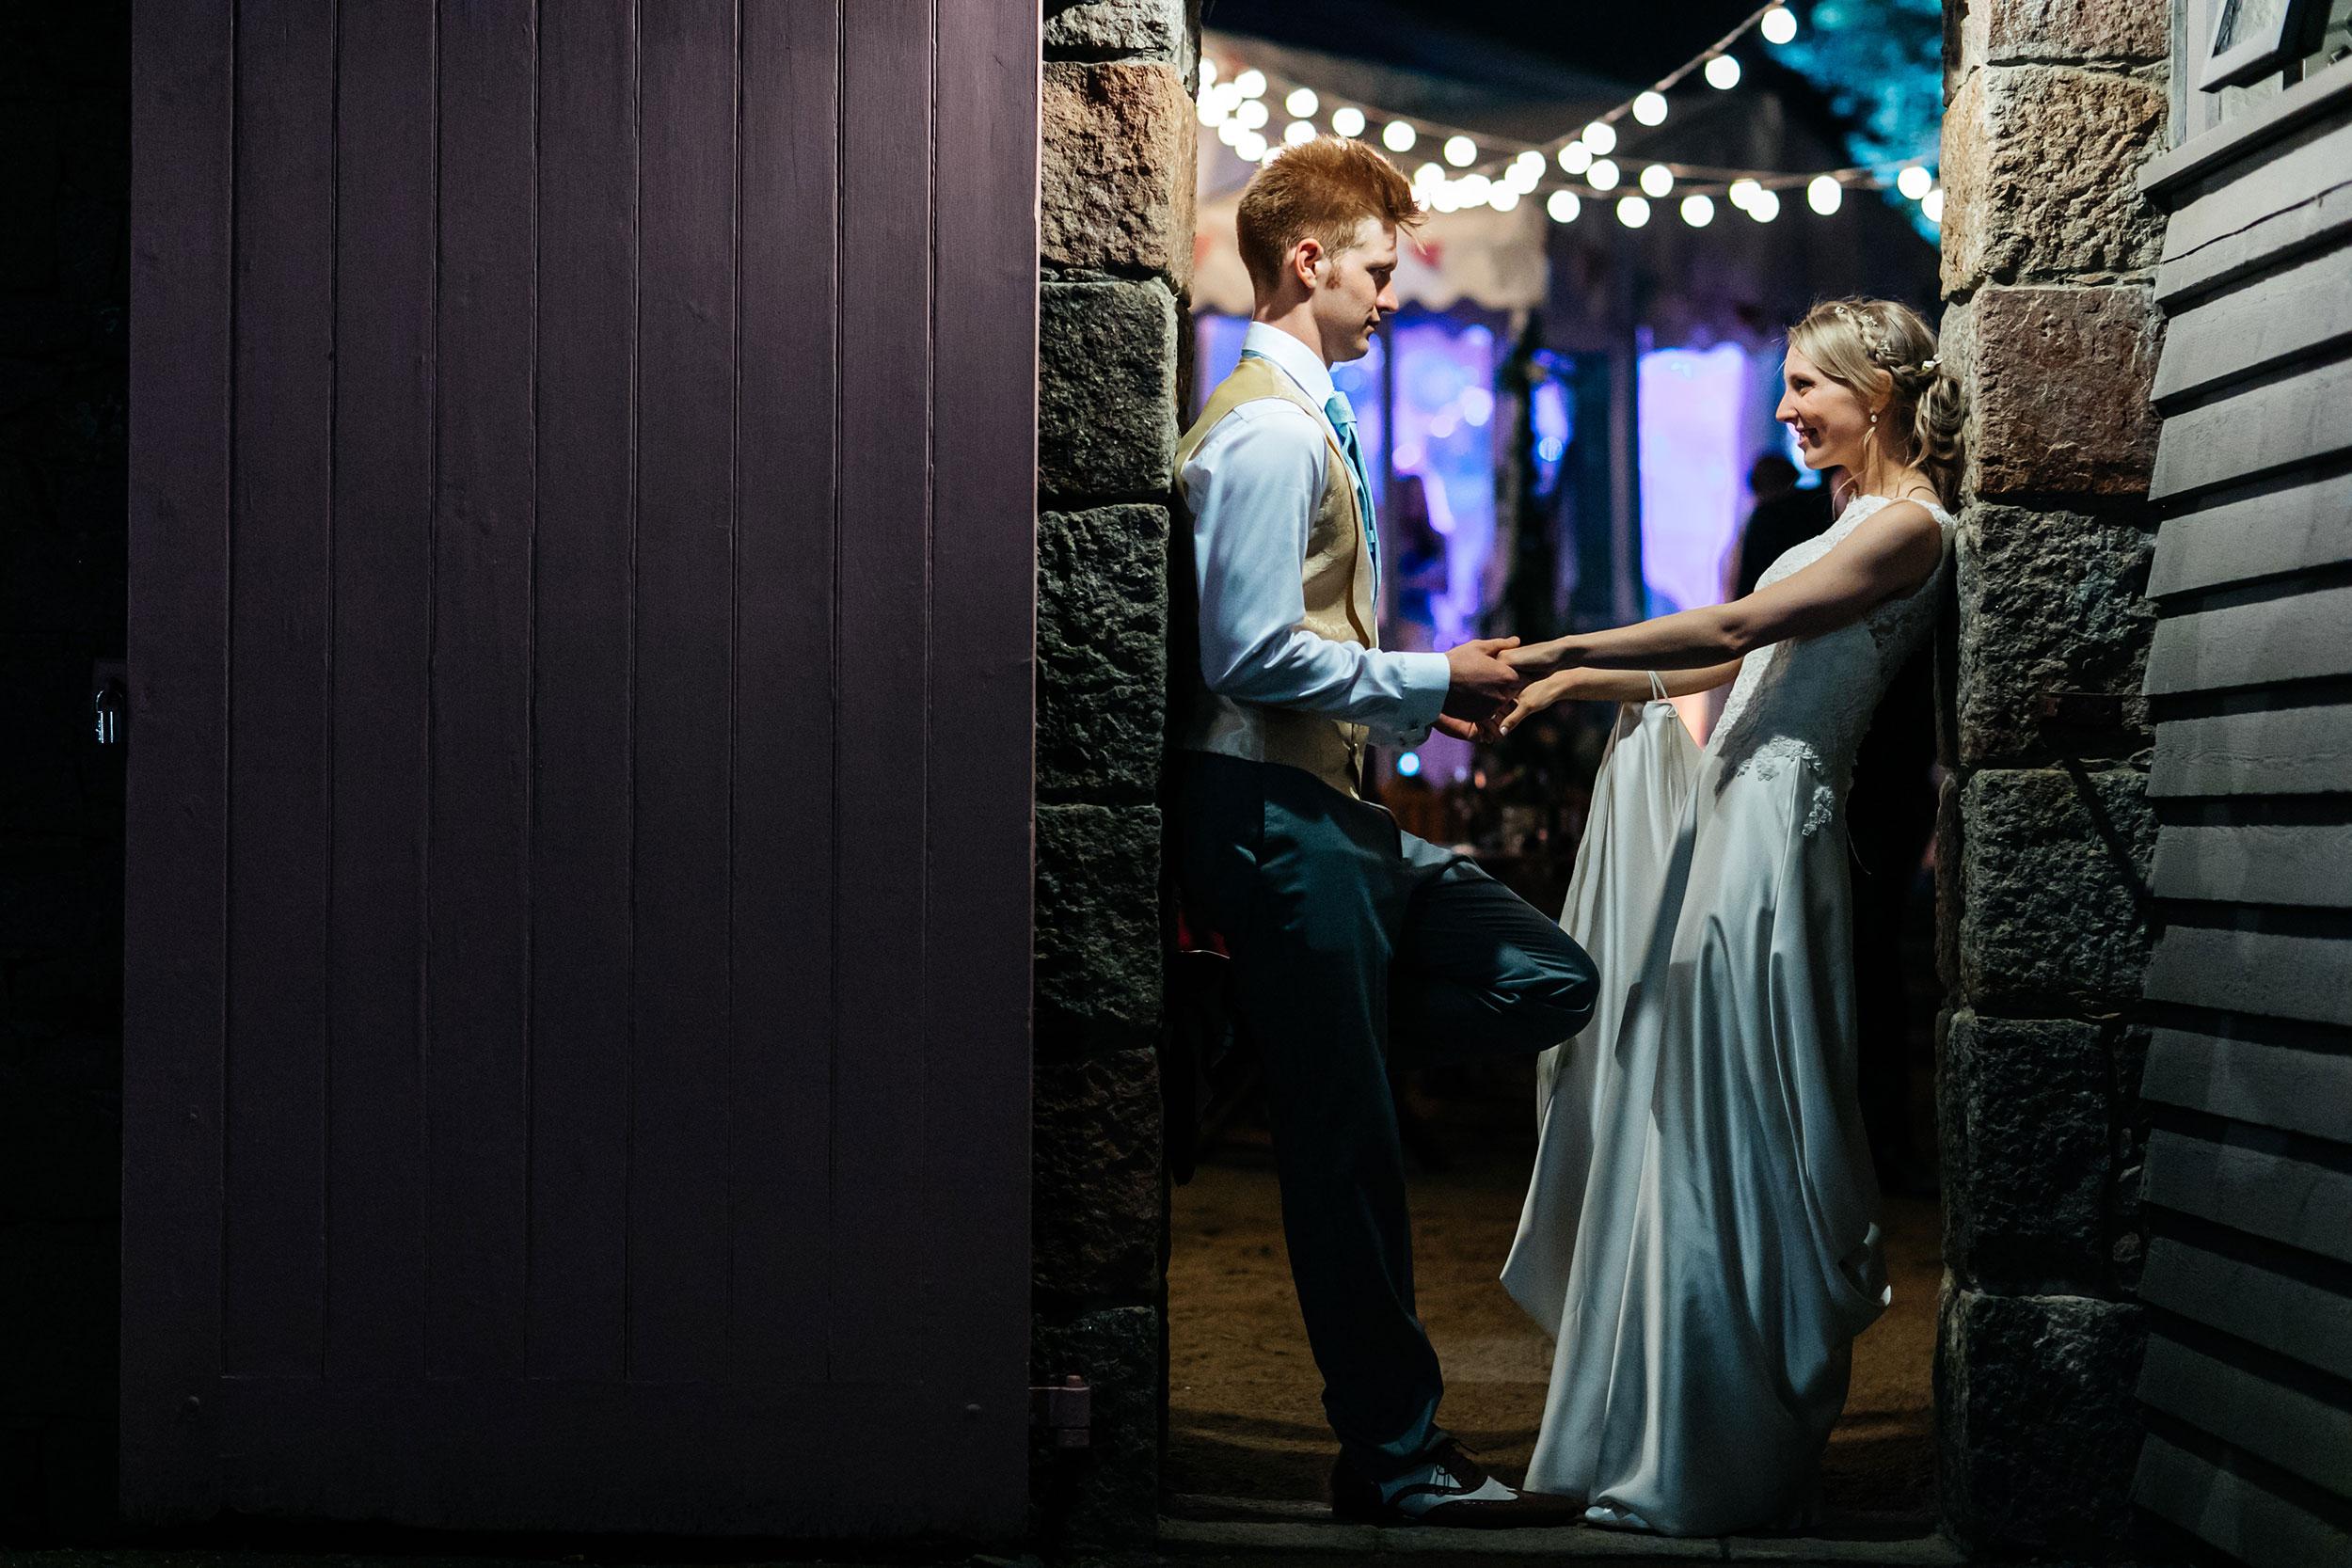 1418_Wedding-Laura-&-Callum-July-2nd_4961.jpg